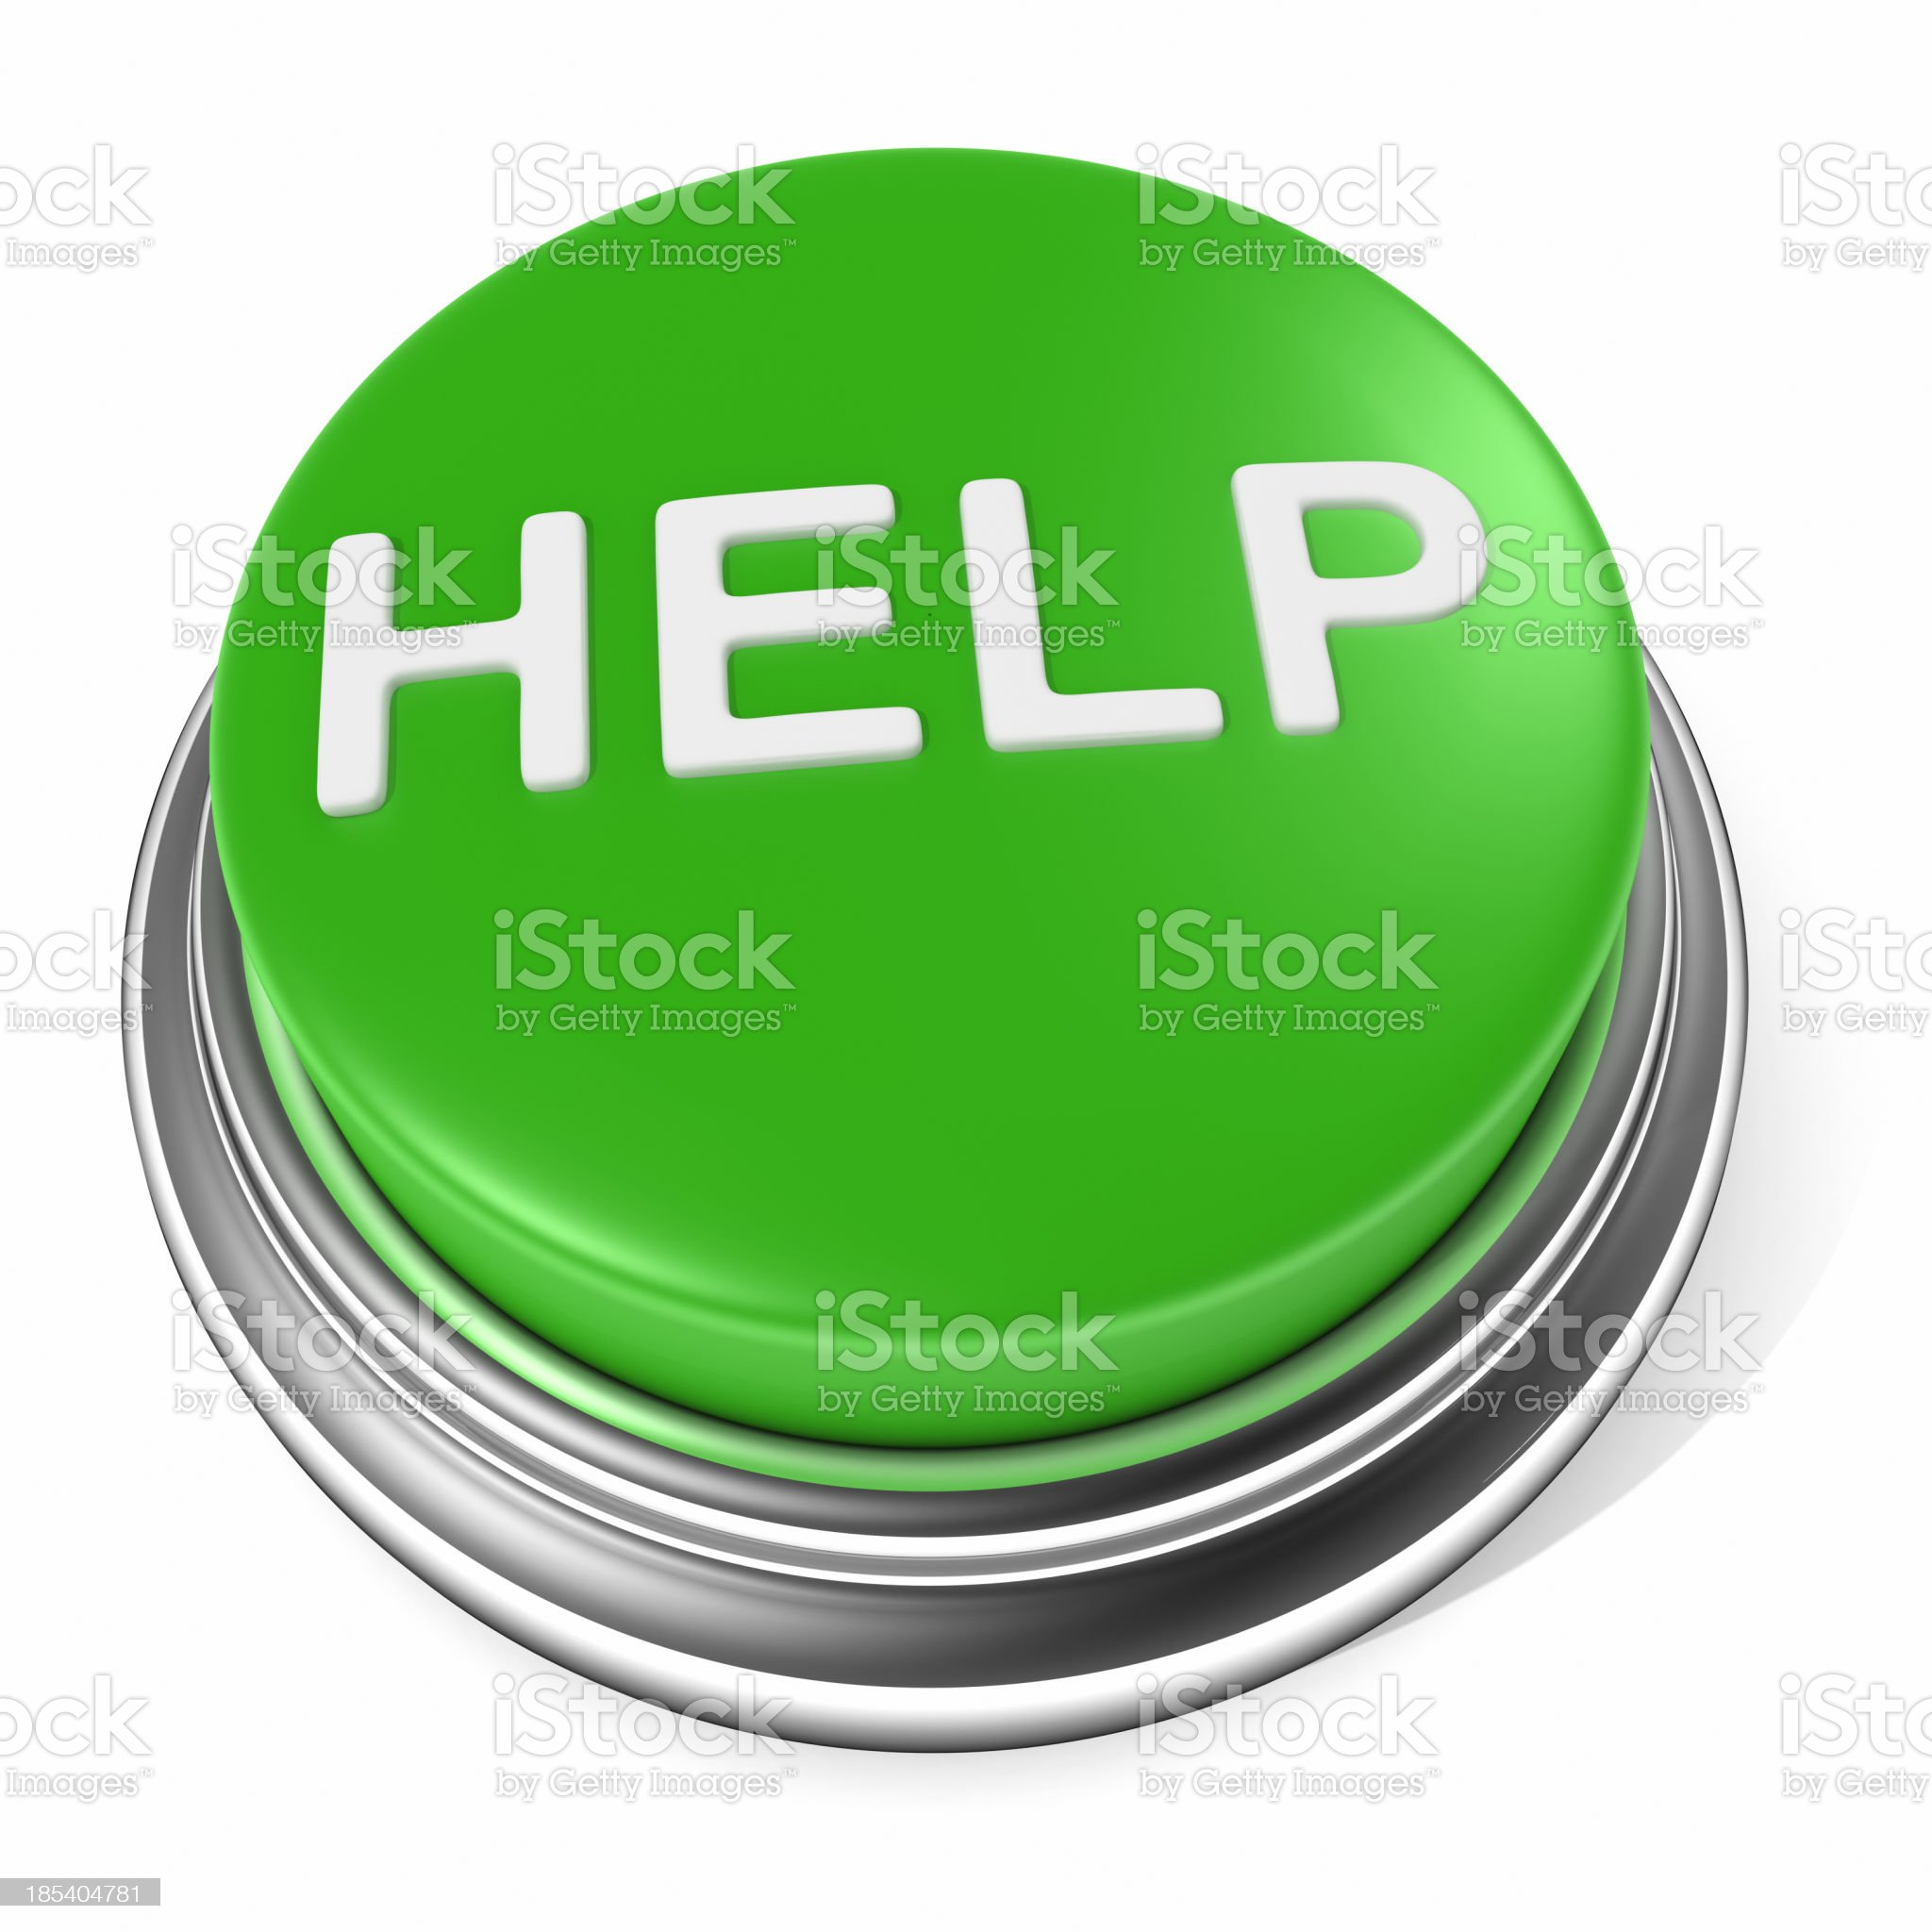 help button icon royalty-free stock photo